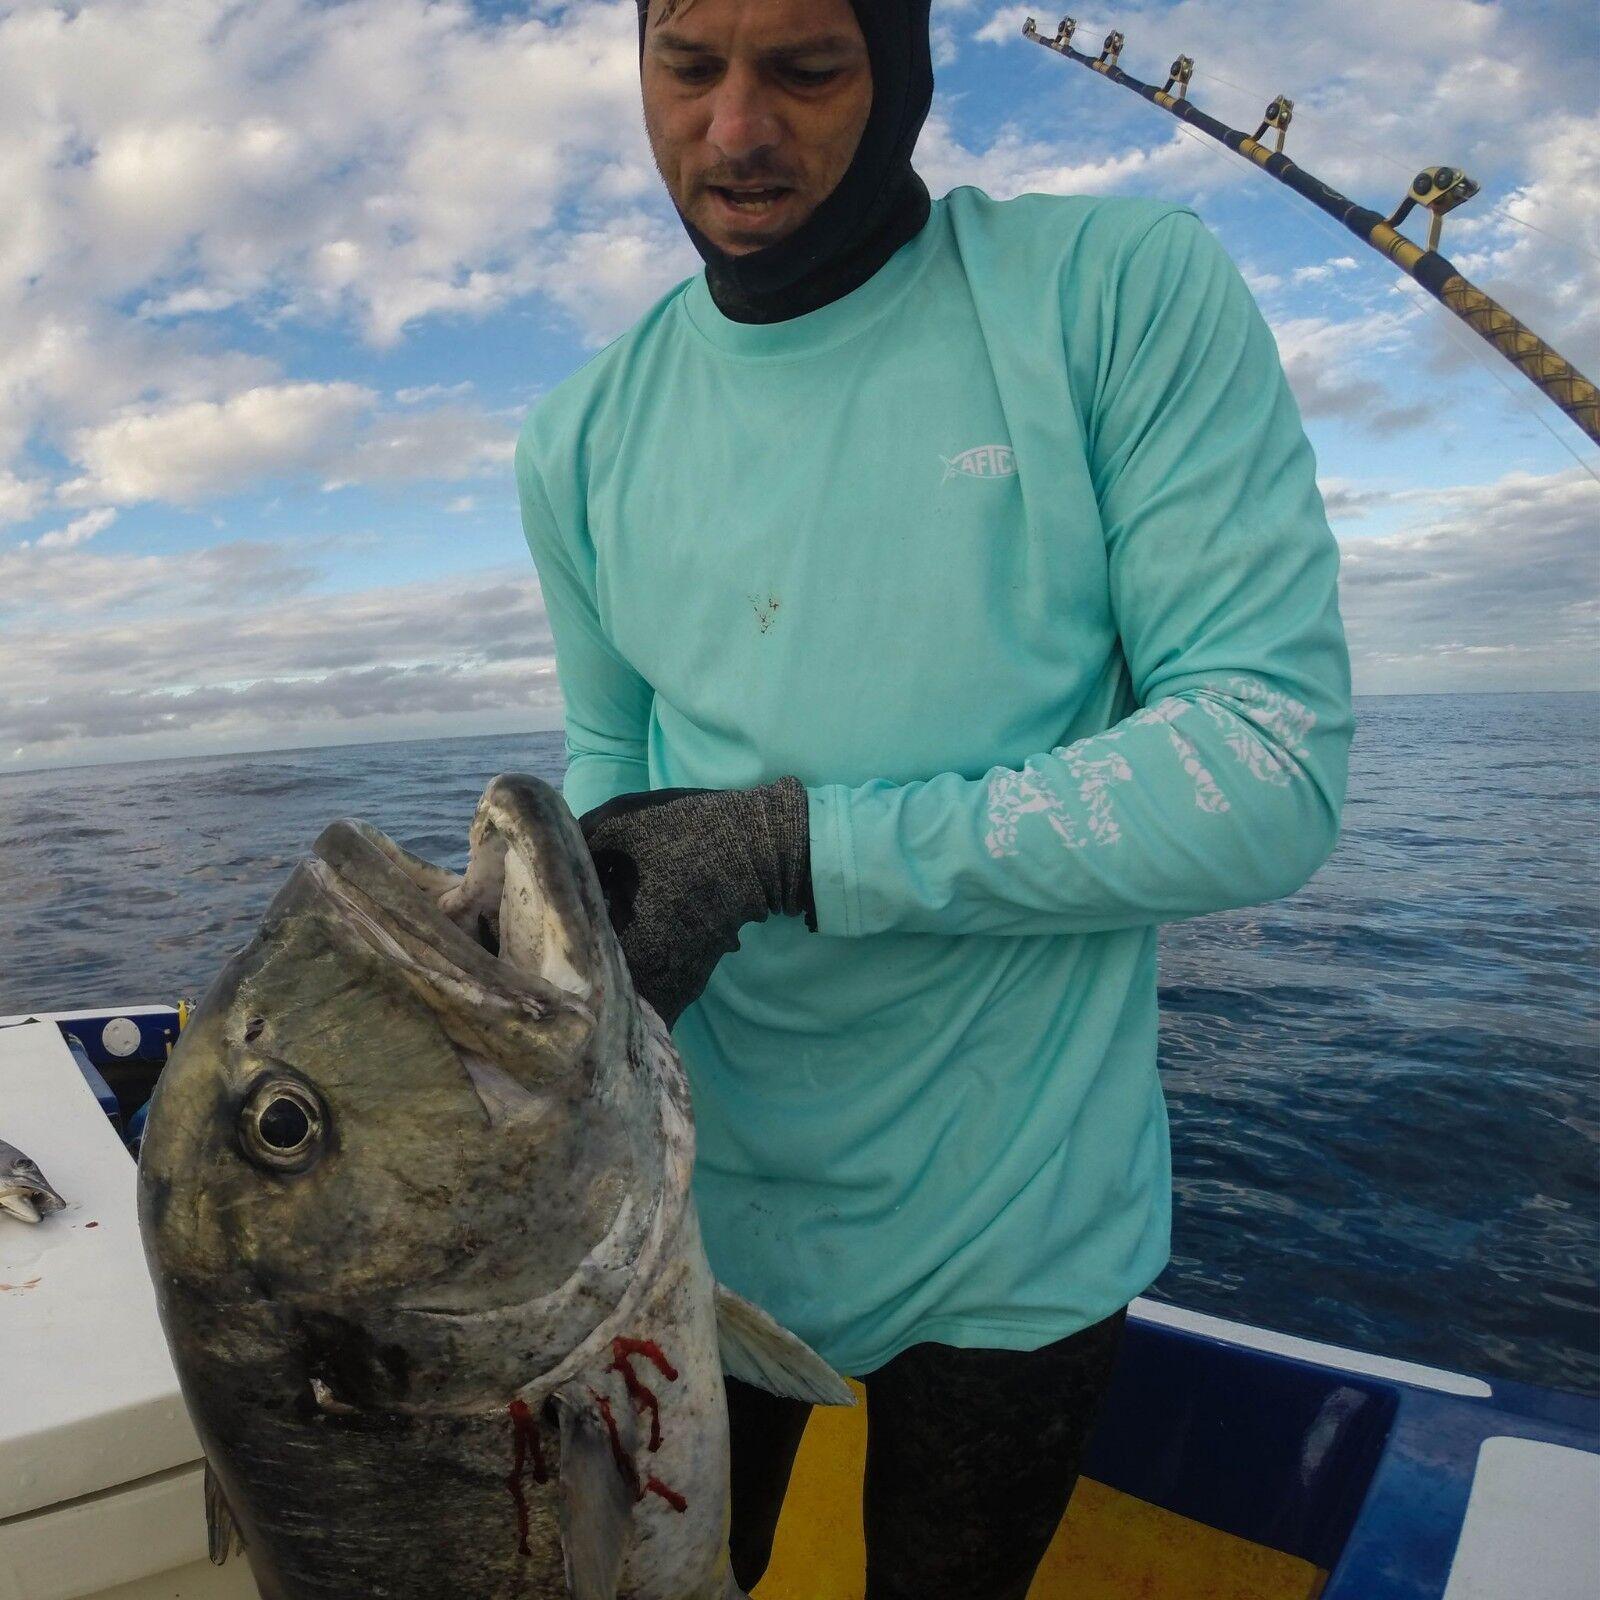 Aftco JigFish Performance Fishing Sun Shirt - UPF 50 - Sky bluee -Free Ship